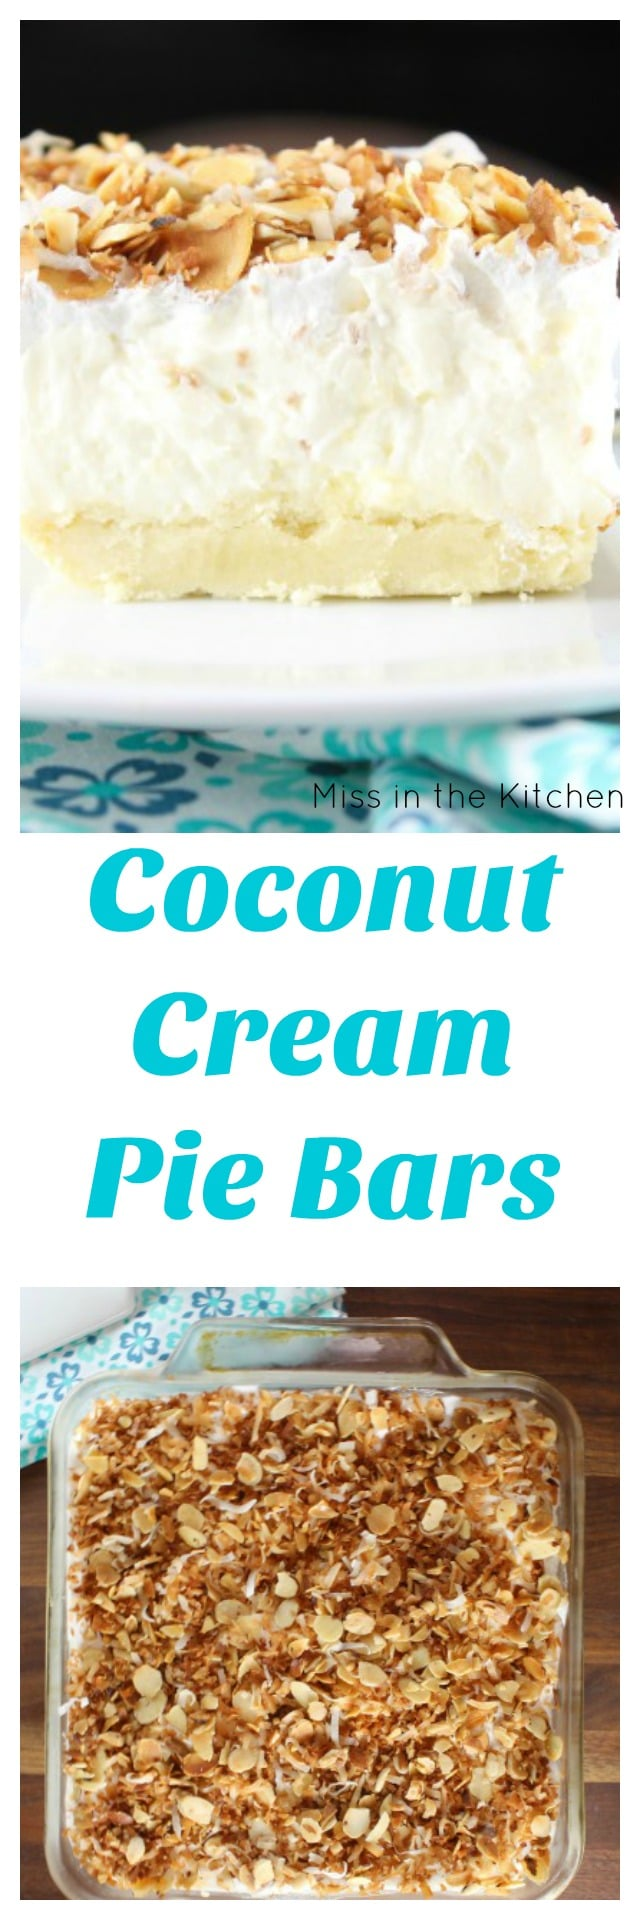 Coconut Cream Pie Bars Recipe found at MissintheKitchen.com